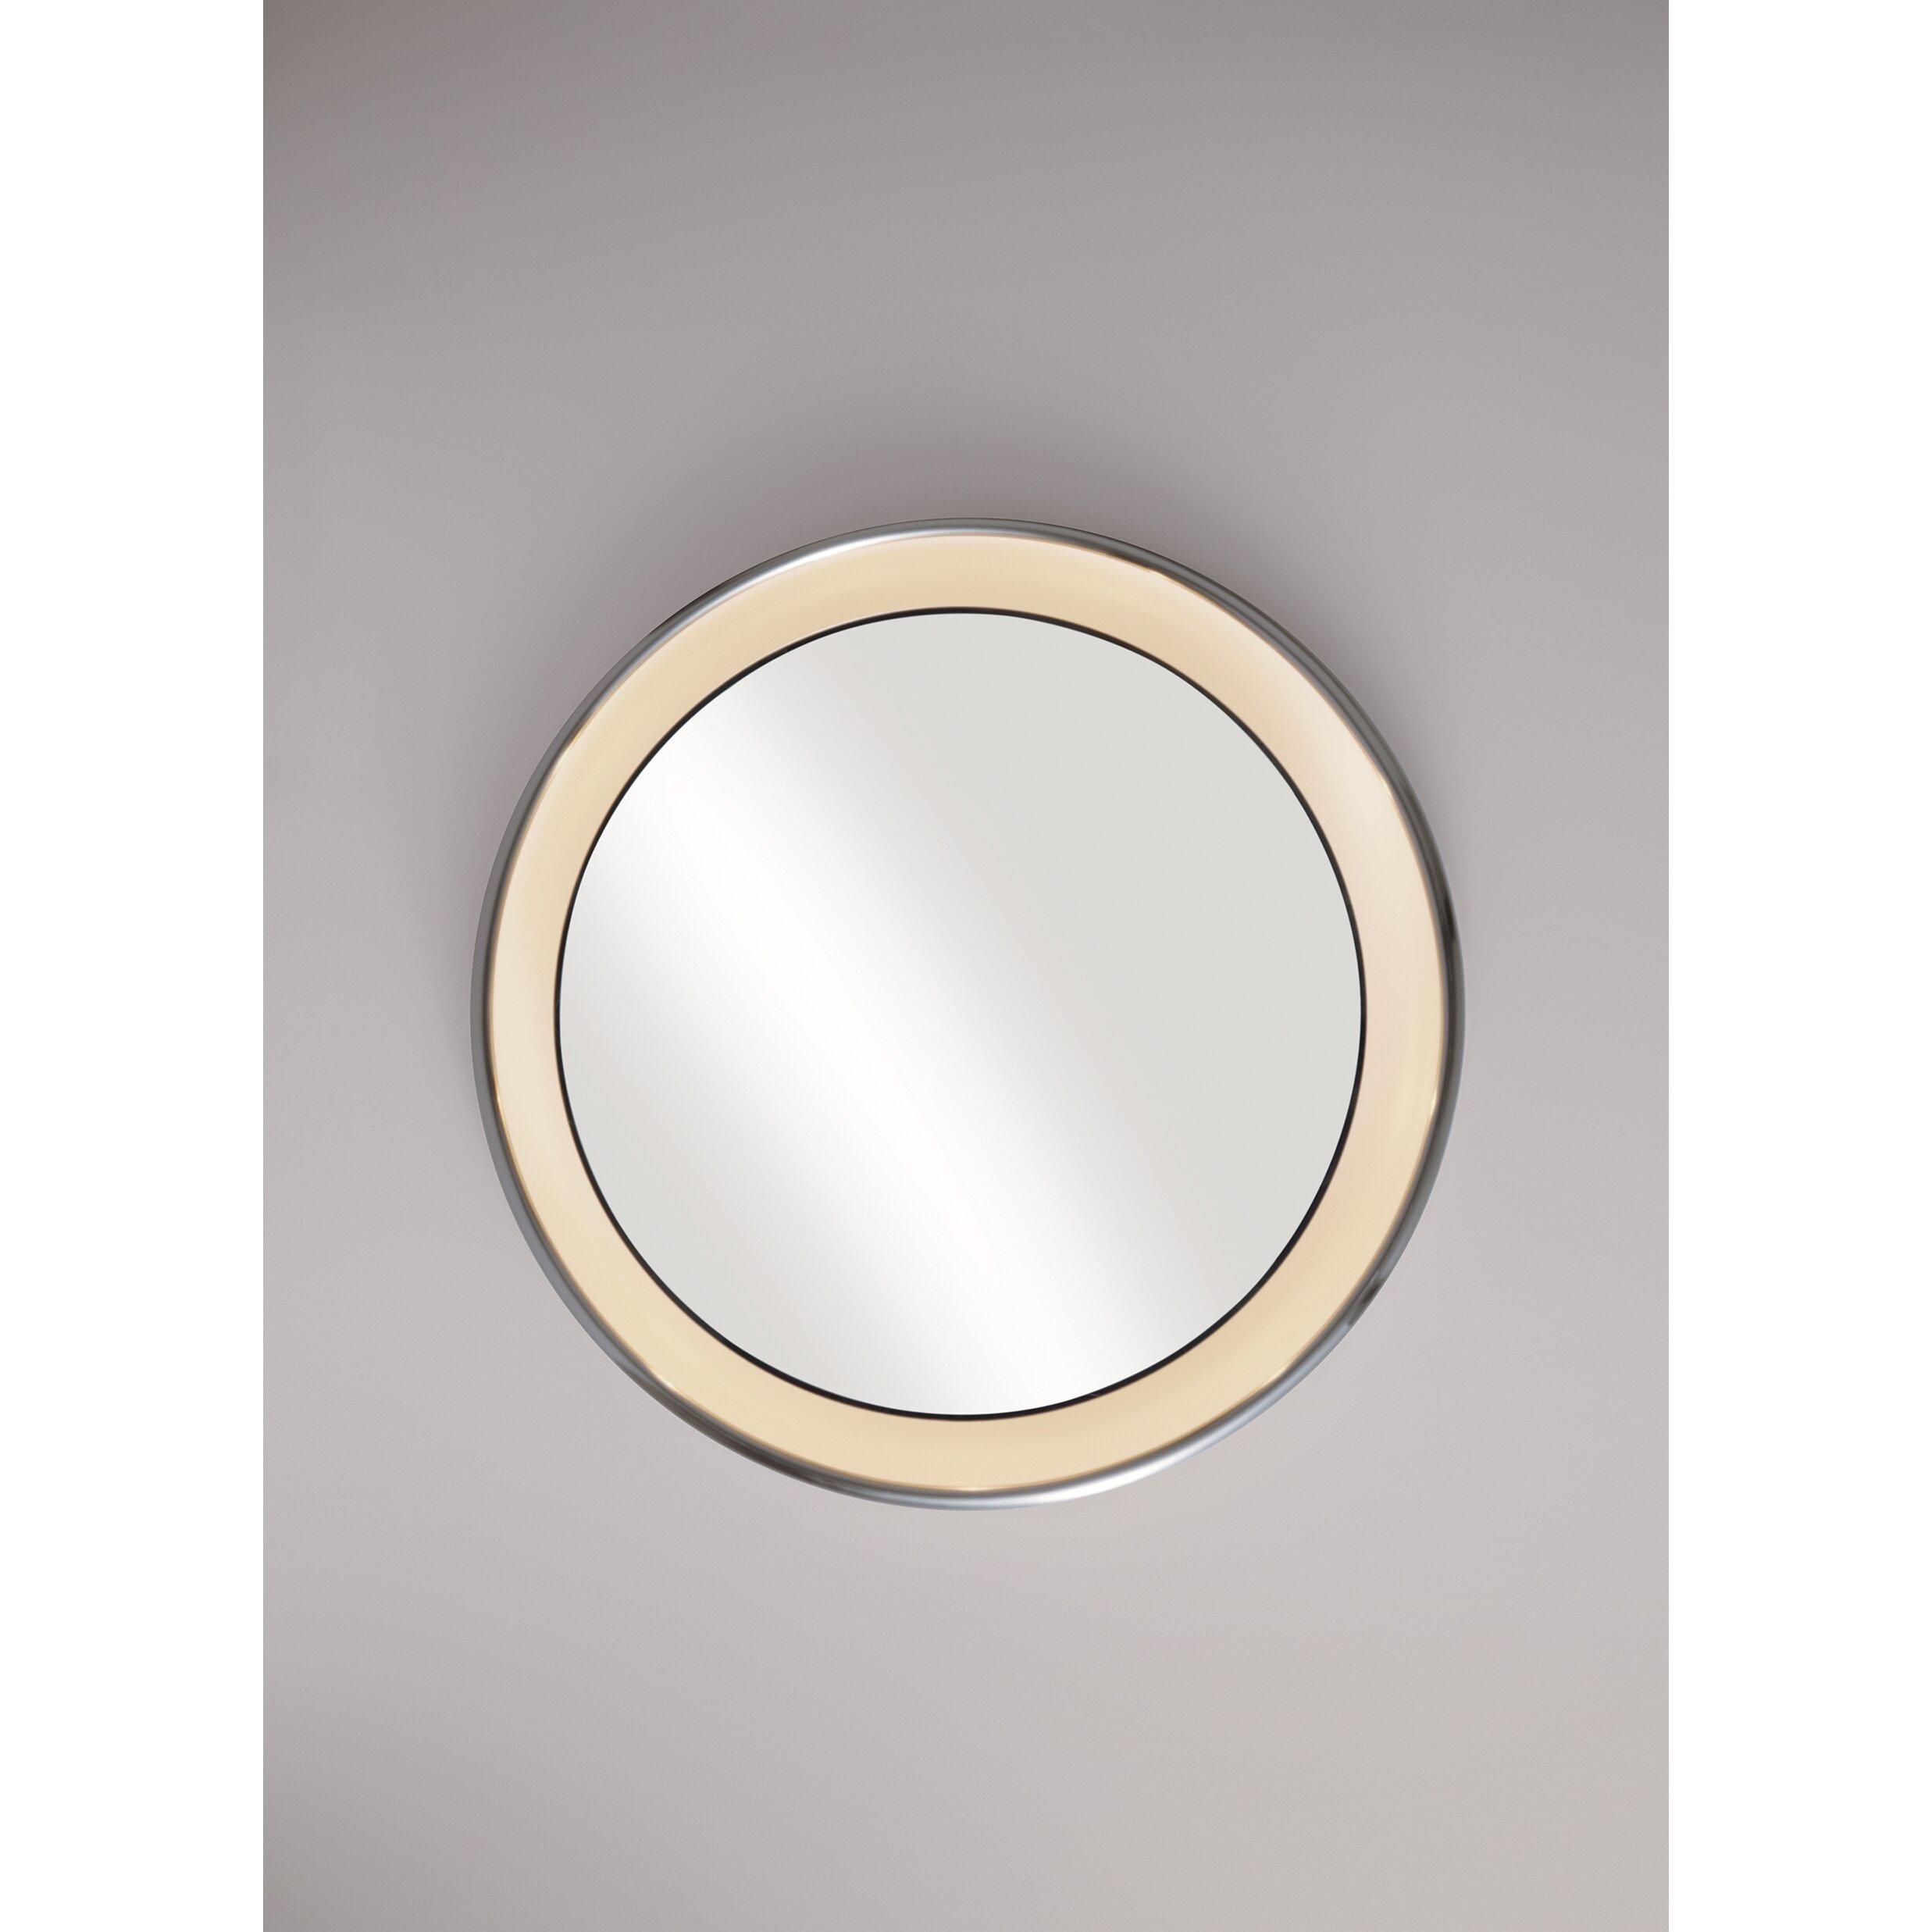 Tech lighting tigris round bath mirror wayfair for Round bathroom mirrors